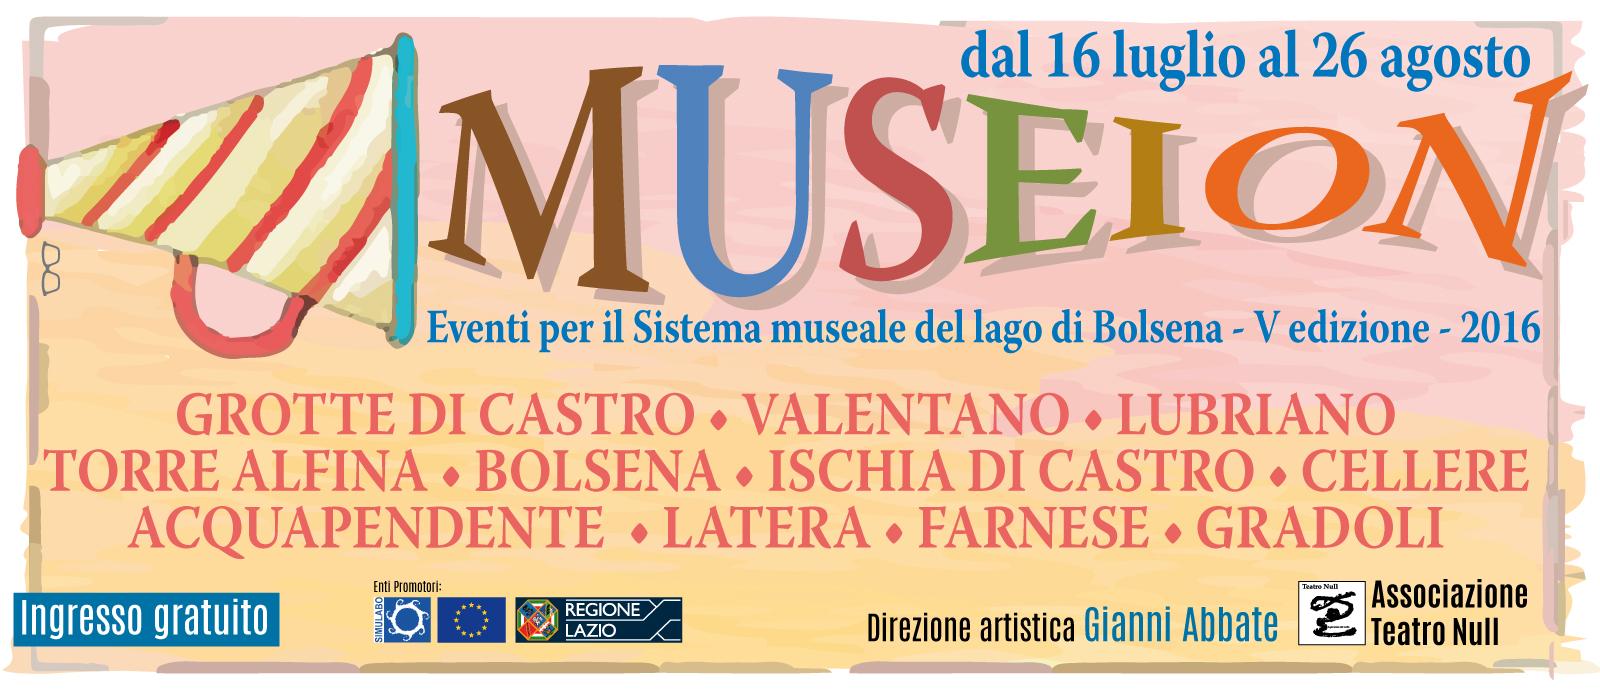 museion 2016